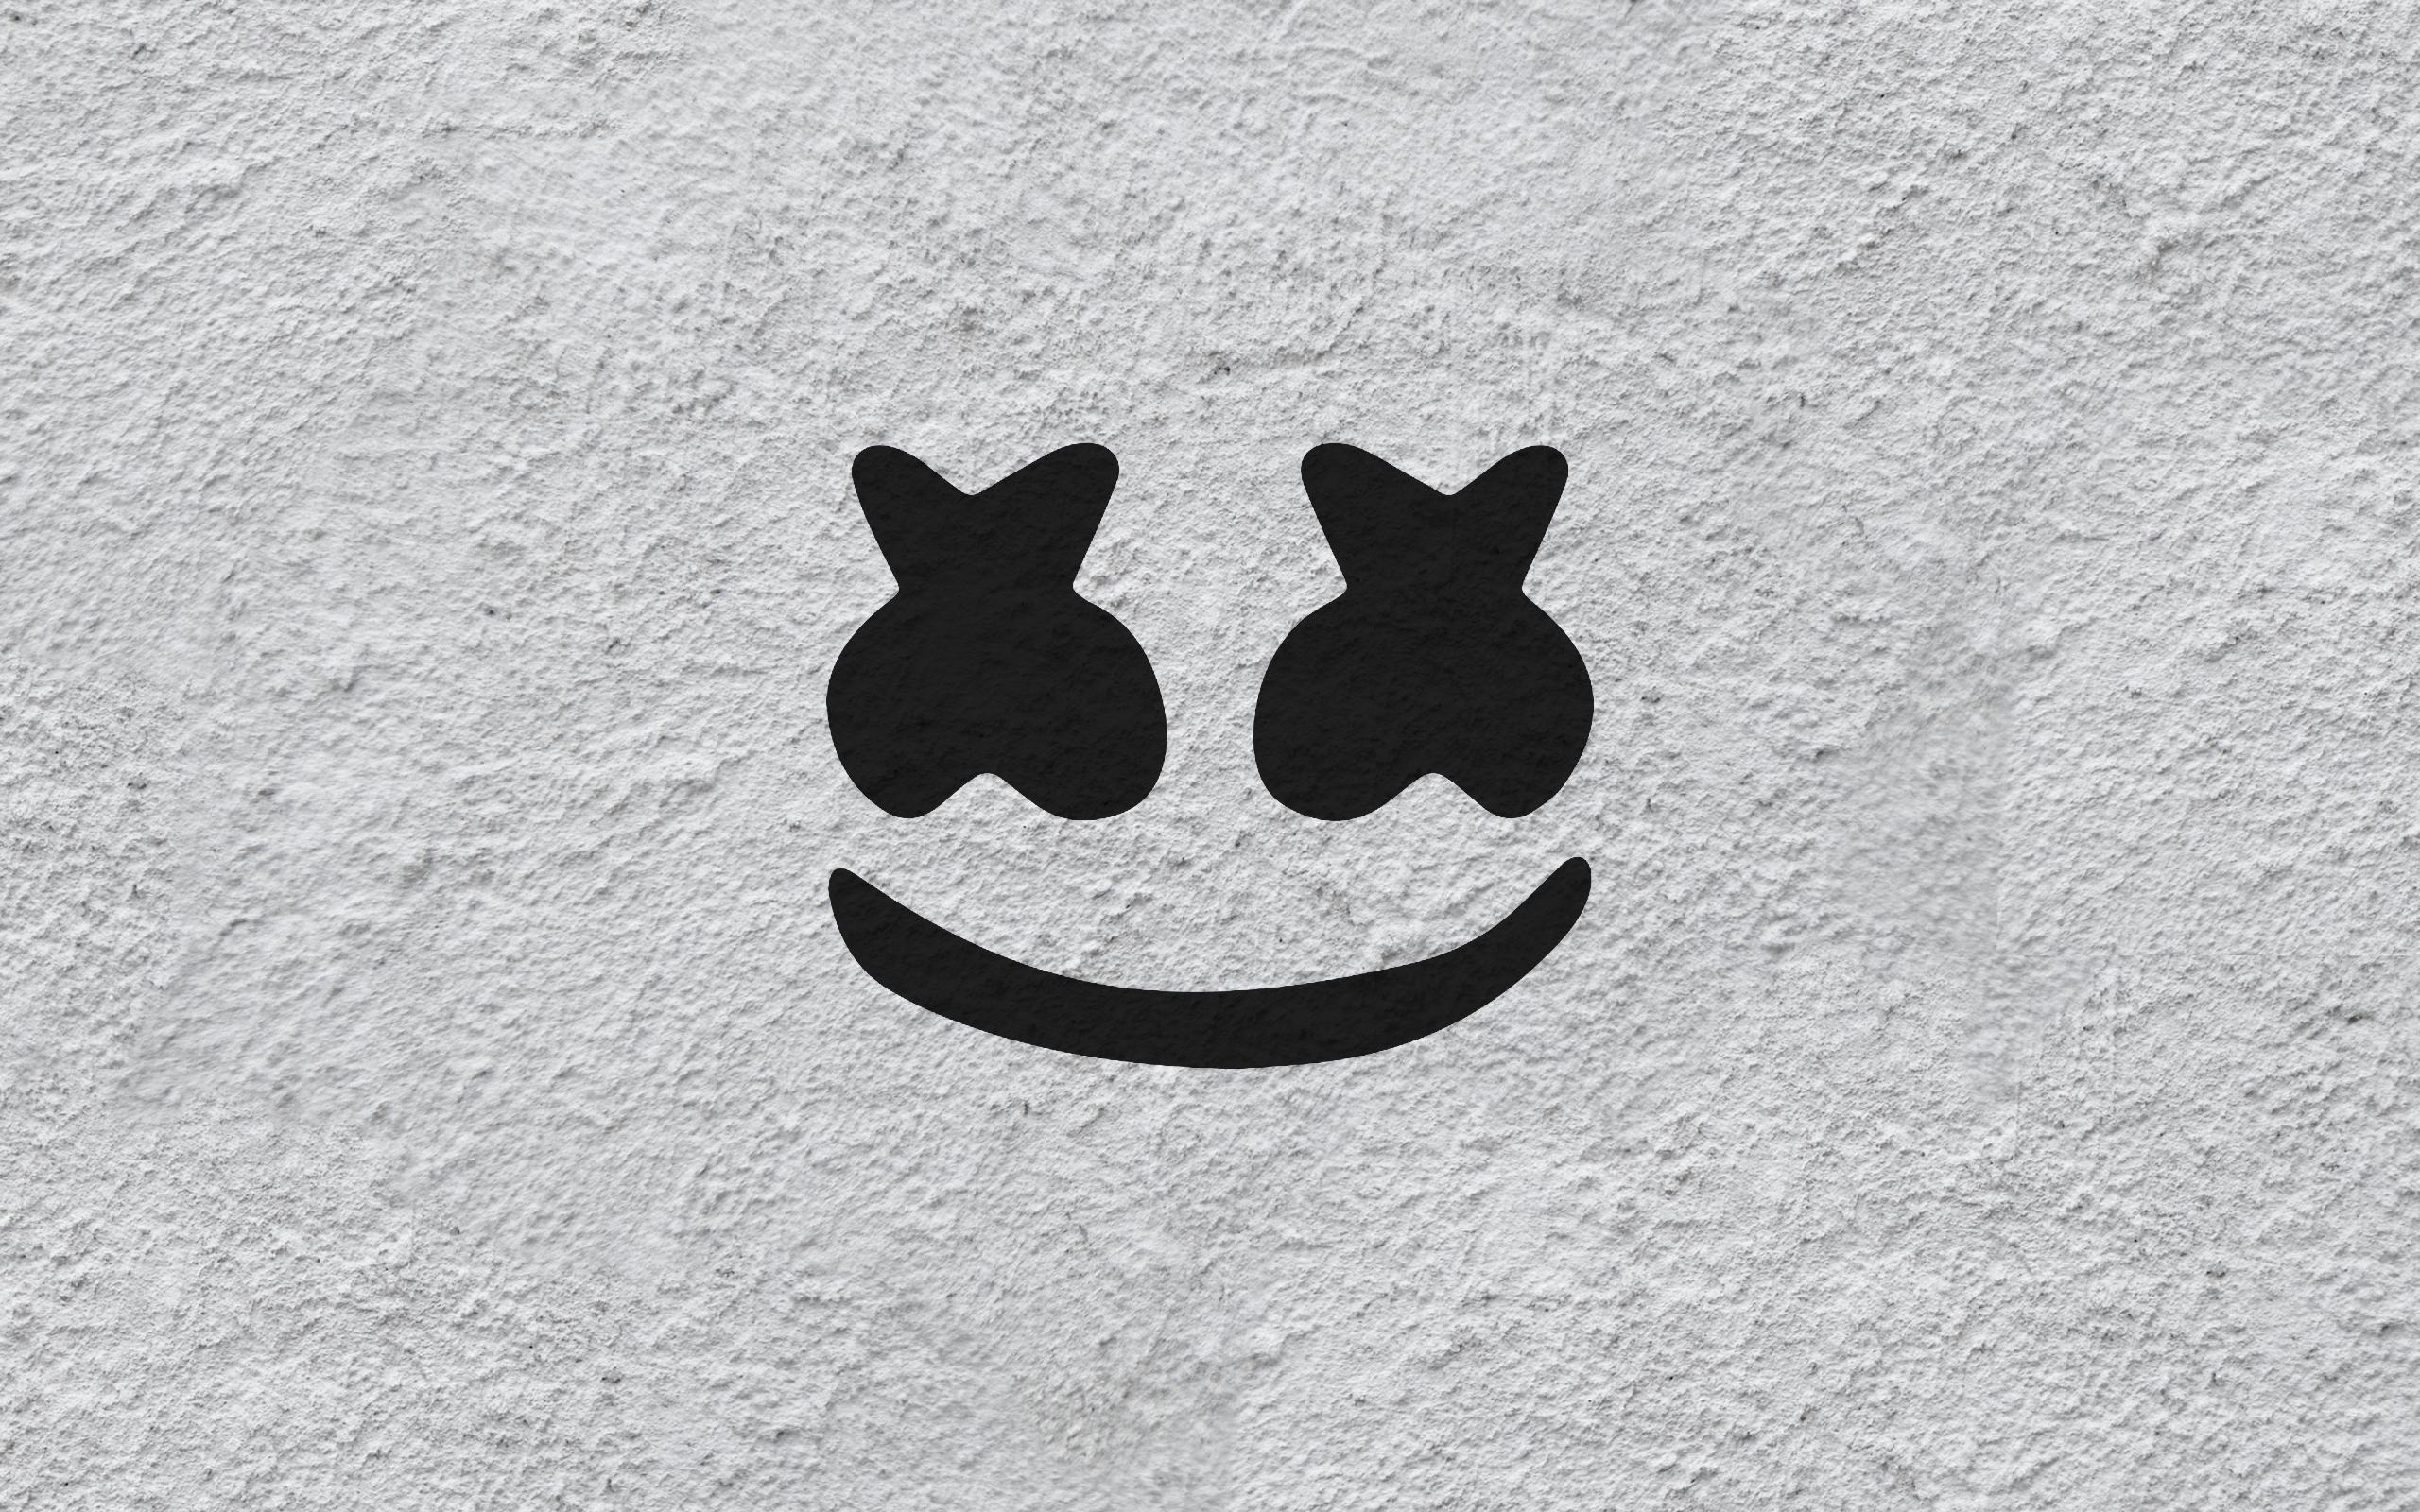 Marshmello Wallpapers Top Free Marshmello Backgrounds